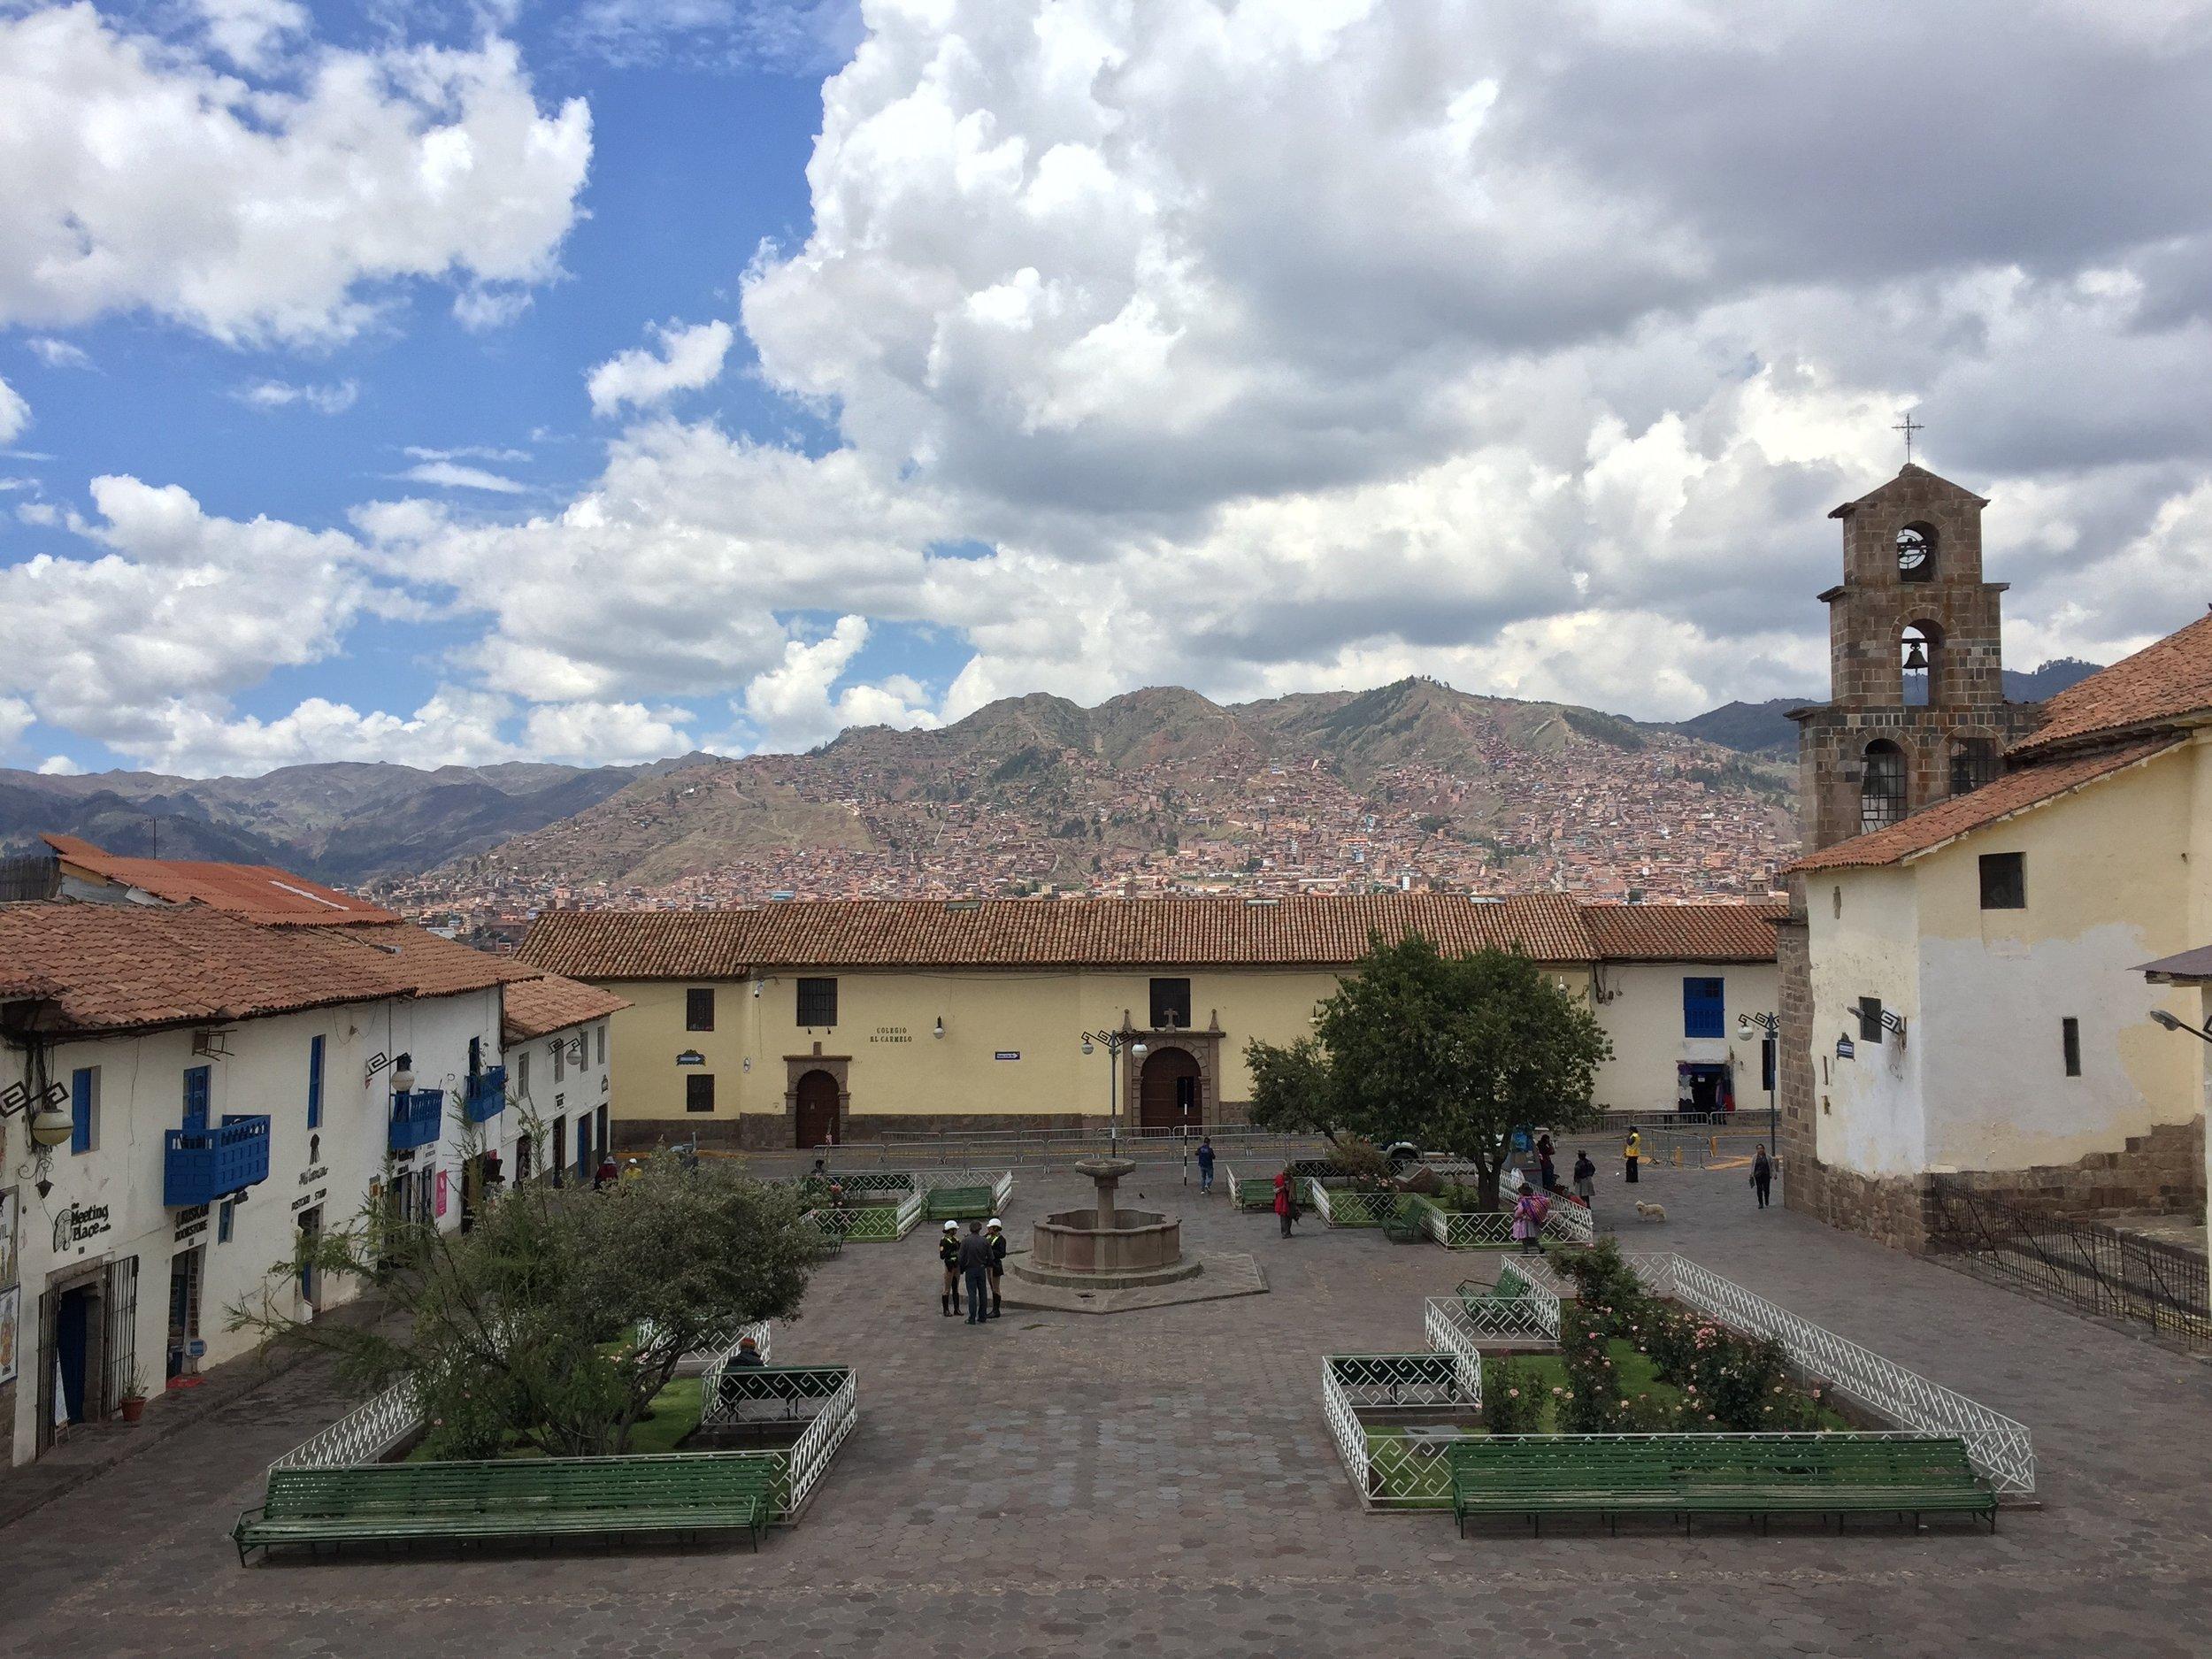 Hotel Recommendations in Cusco - Hotel Cusco JungleNiños Hotel MelocHostal Cusi WasiHotel Royal QosqoPisko & Soul